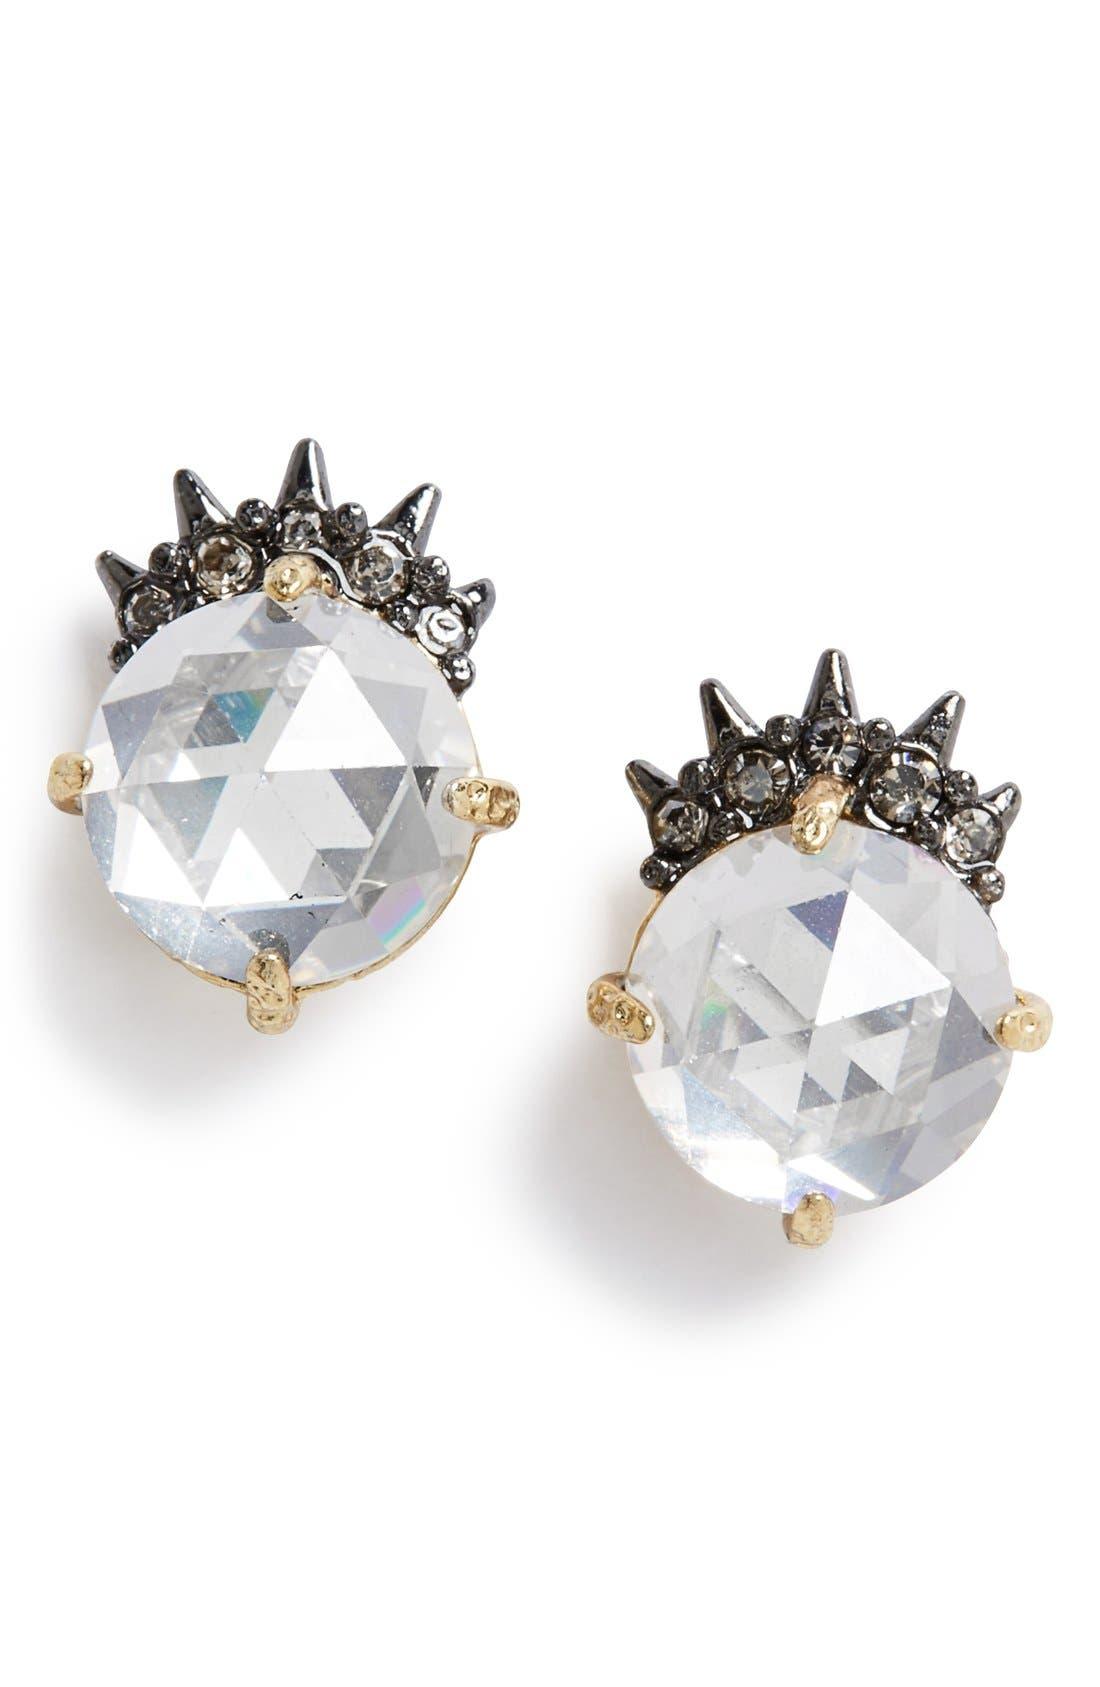 Alternate Image 1 Selected - Alexis Bittar'Elements'Spiked Crystal Stud Earrings